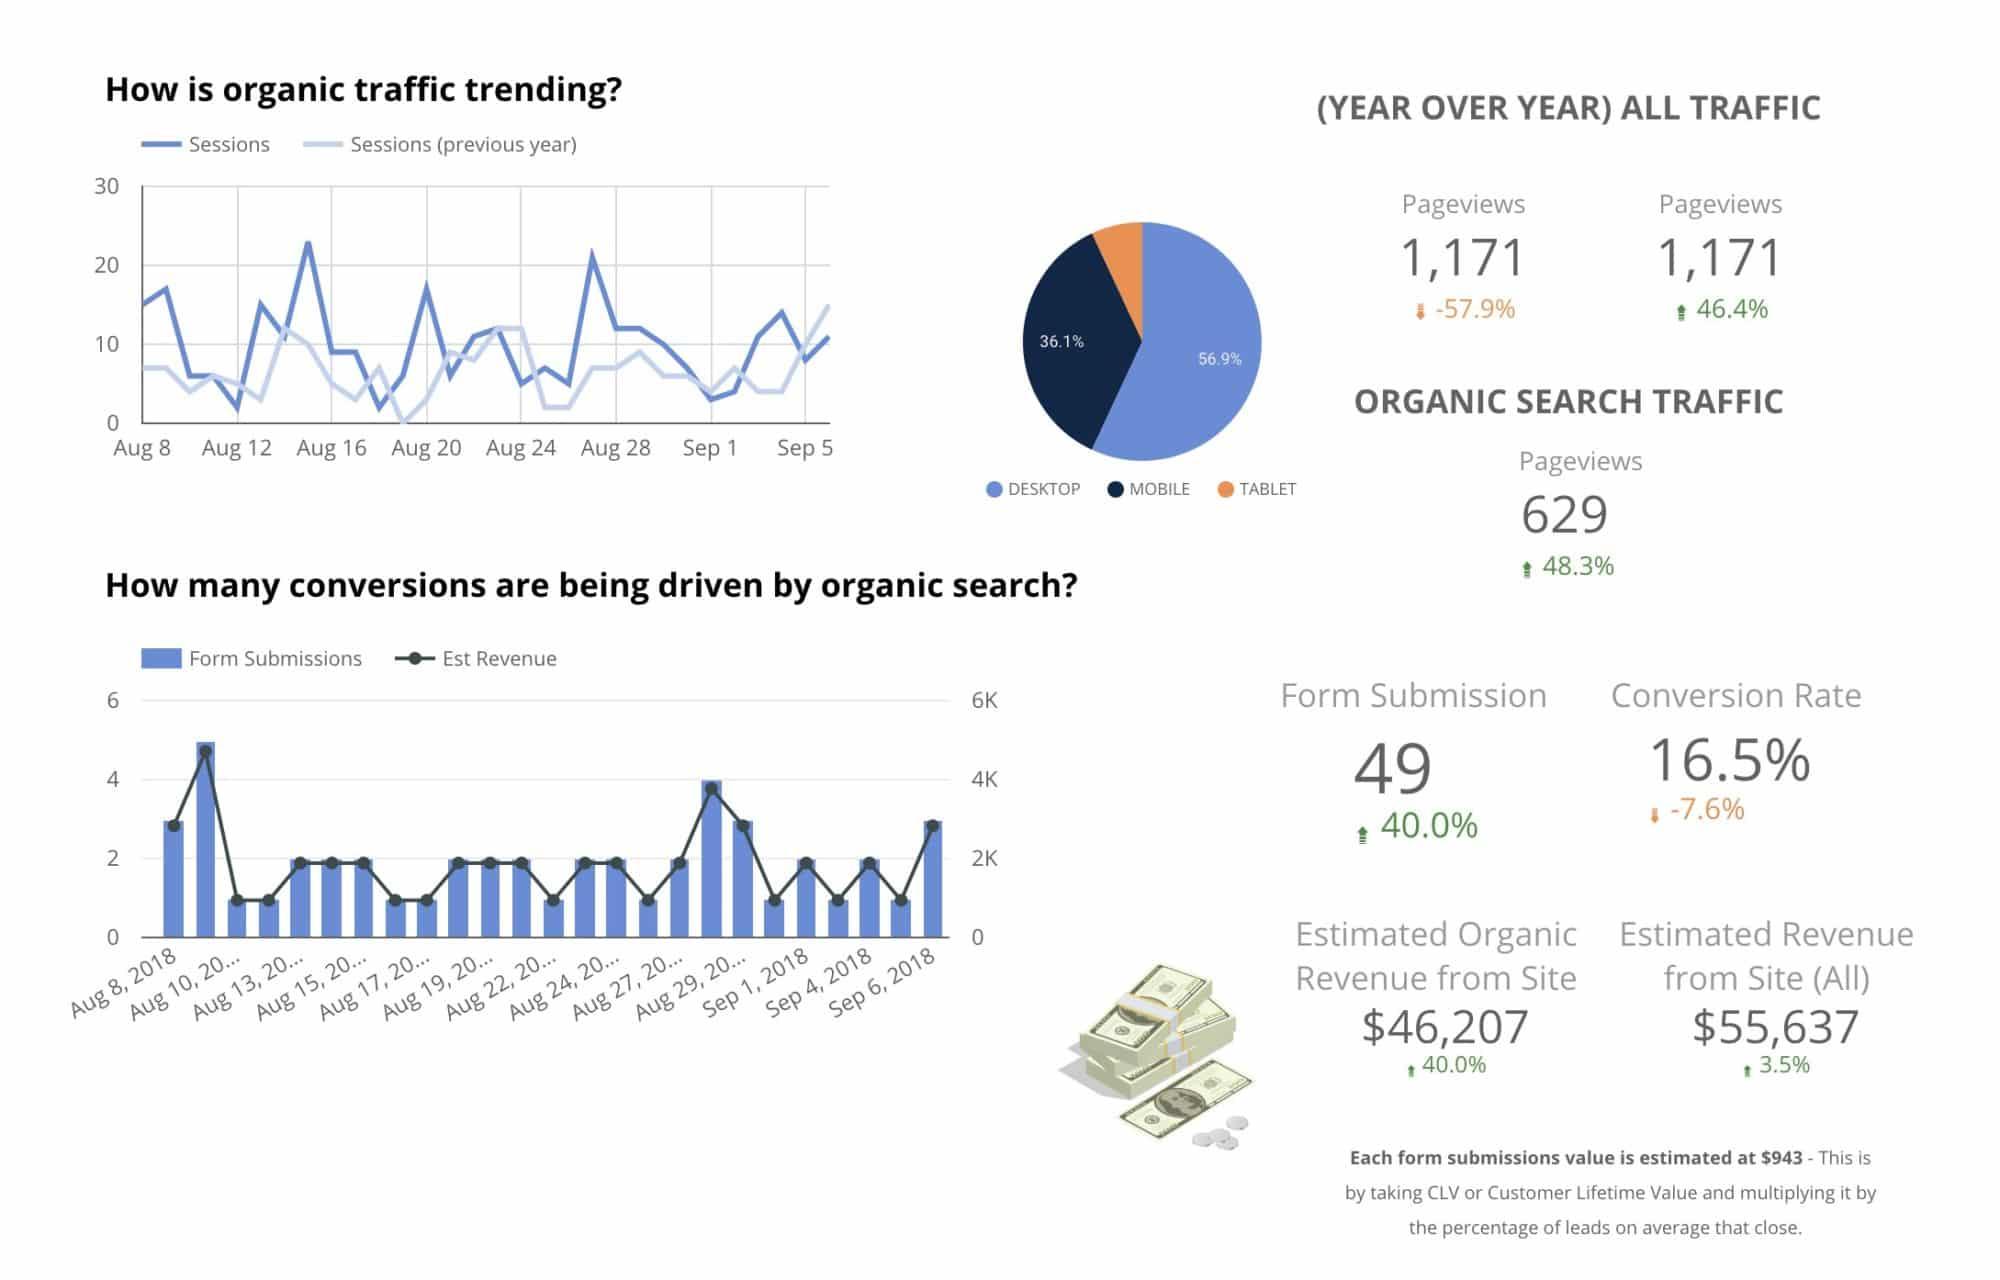 Google Data Studio - Customer Lifetime Value x Percentage that close = Average Lead Value